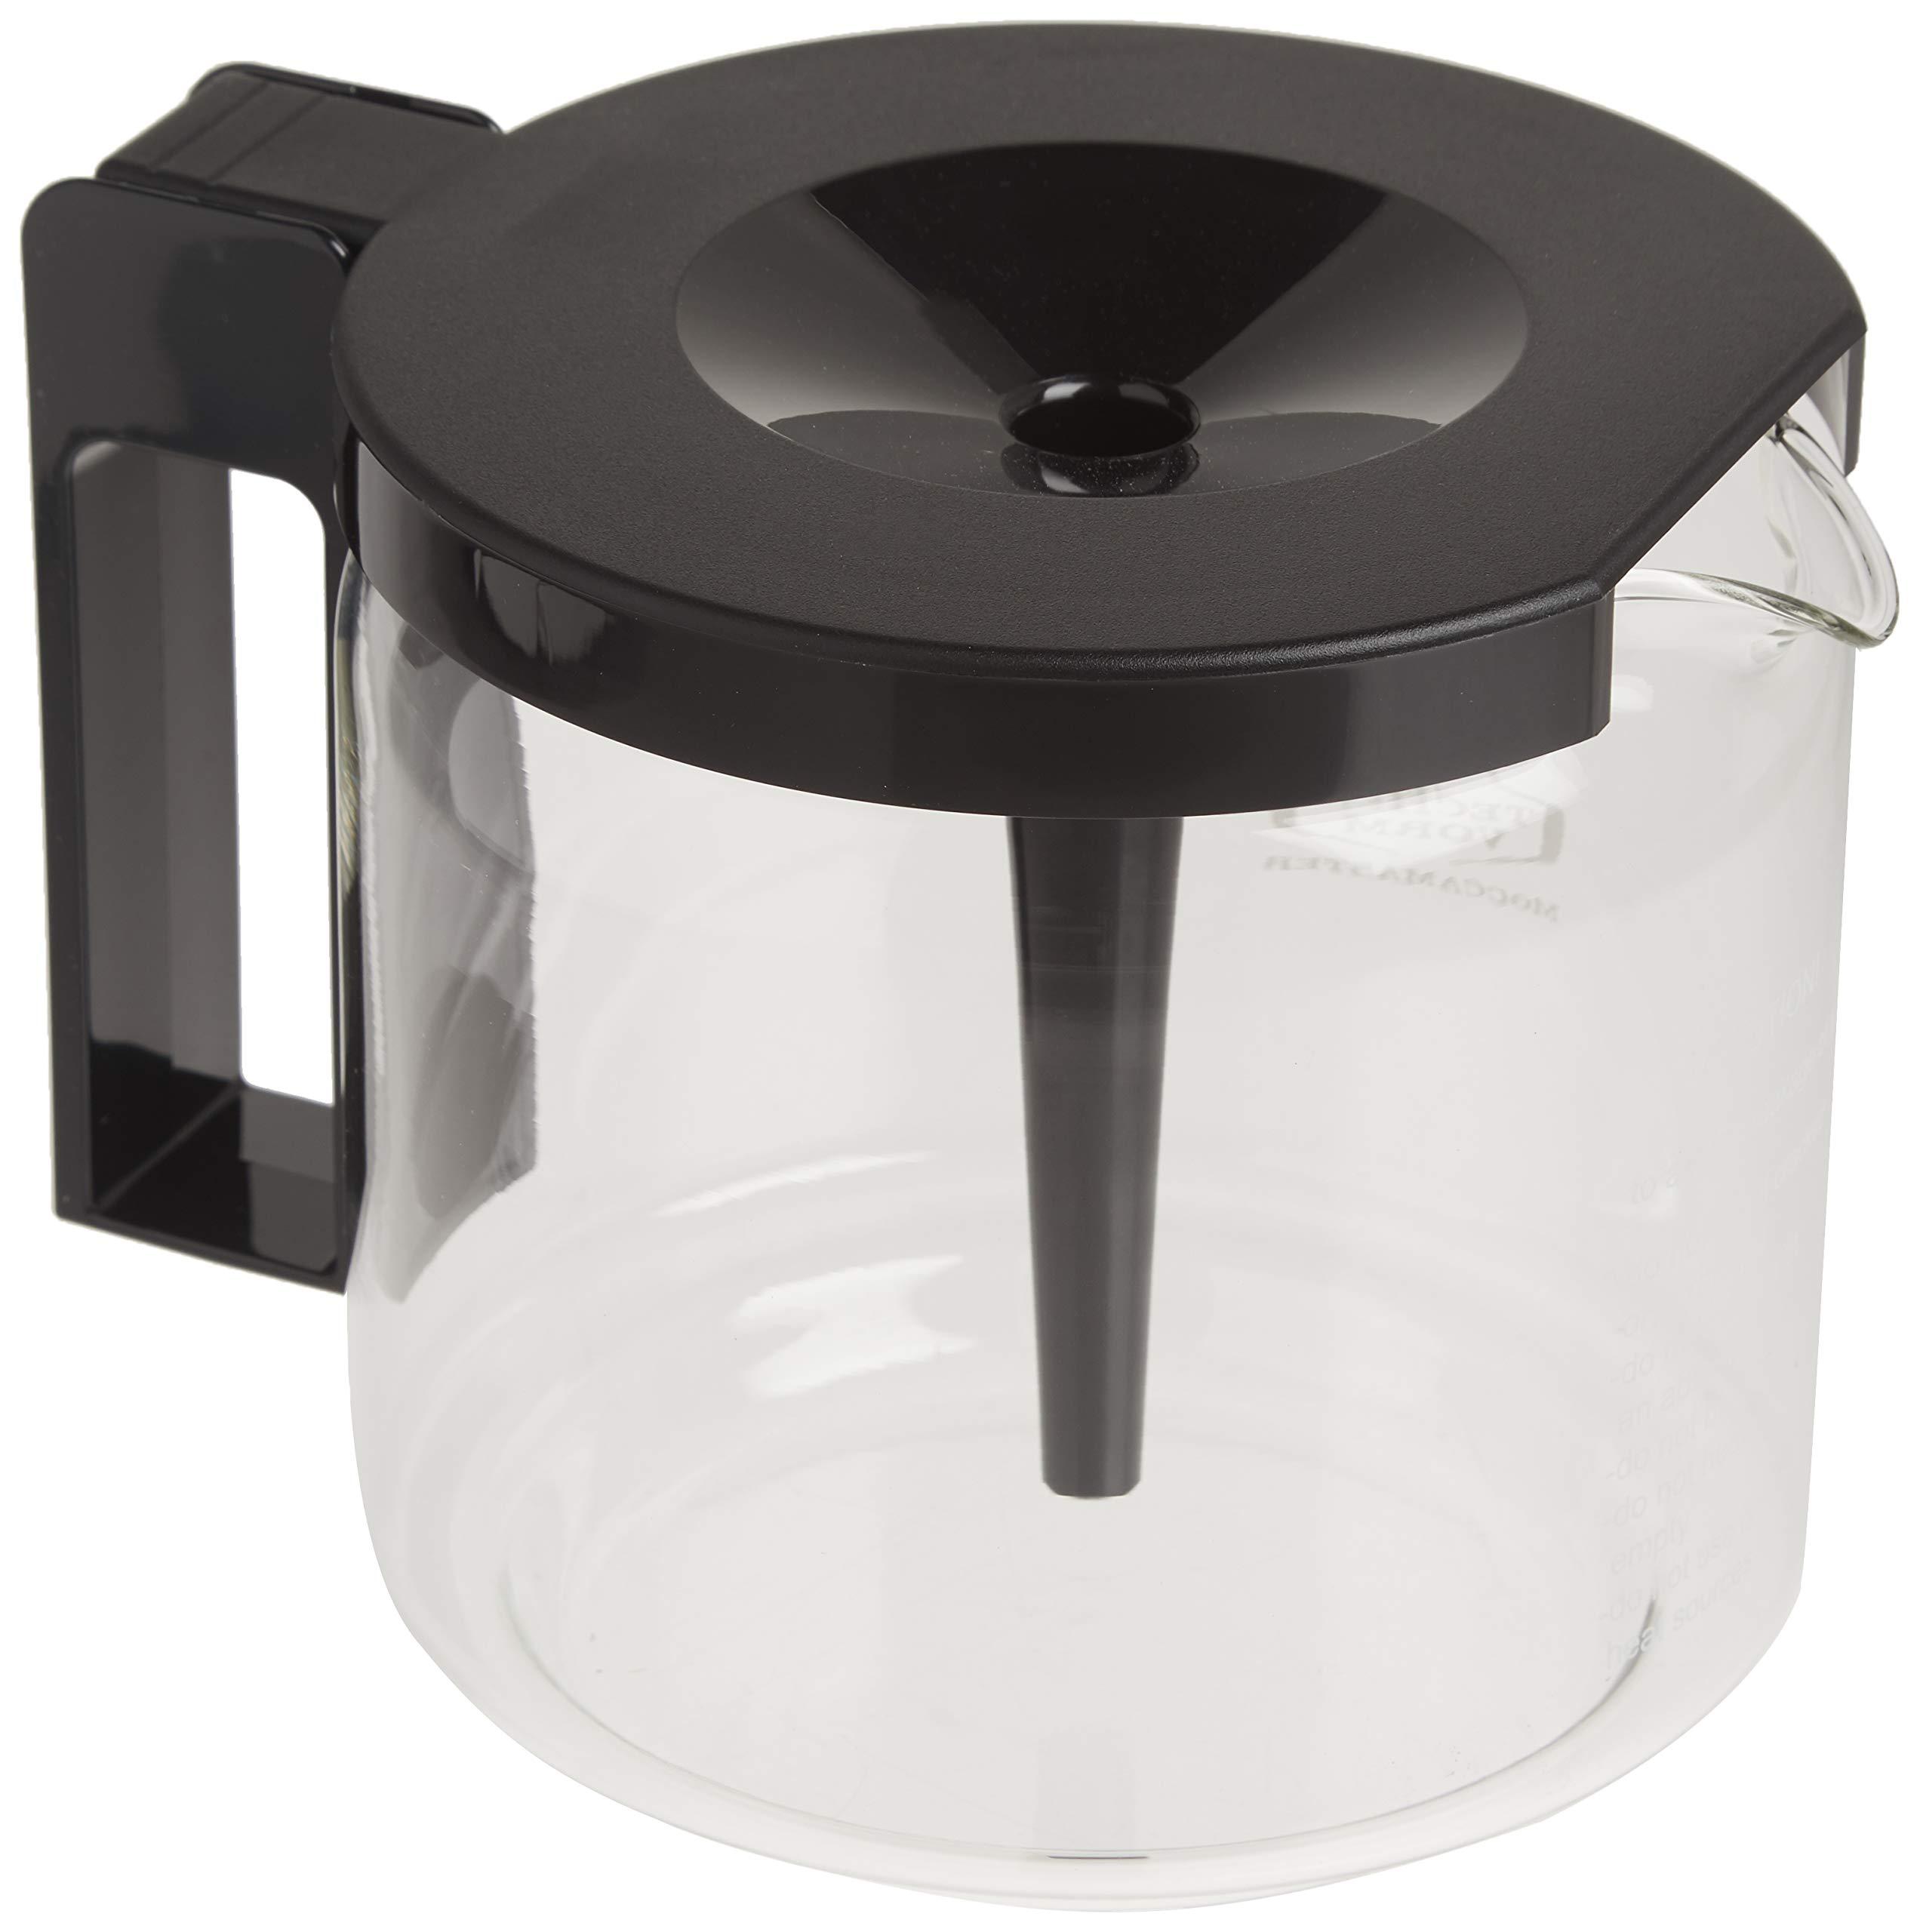 Technivorm 89830 1.25L Glass Carafe, for KBG Brewers